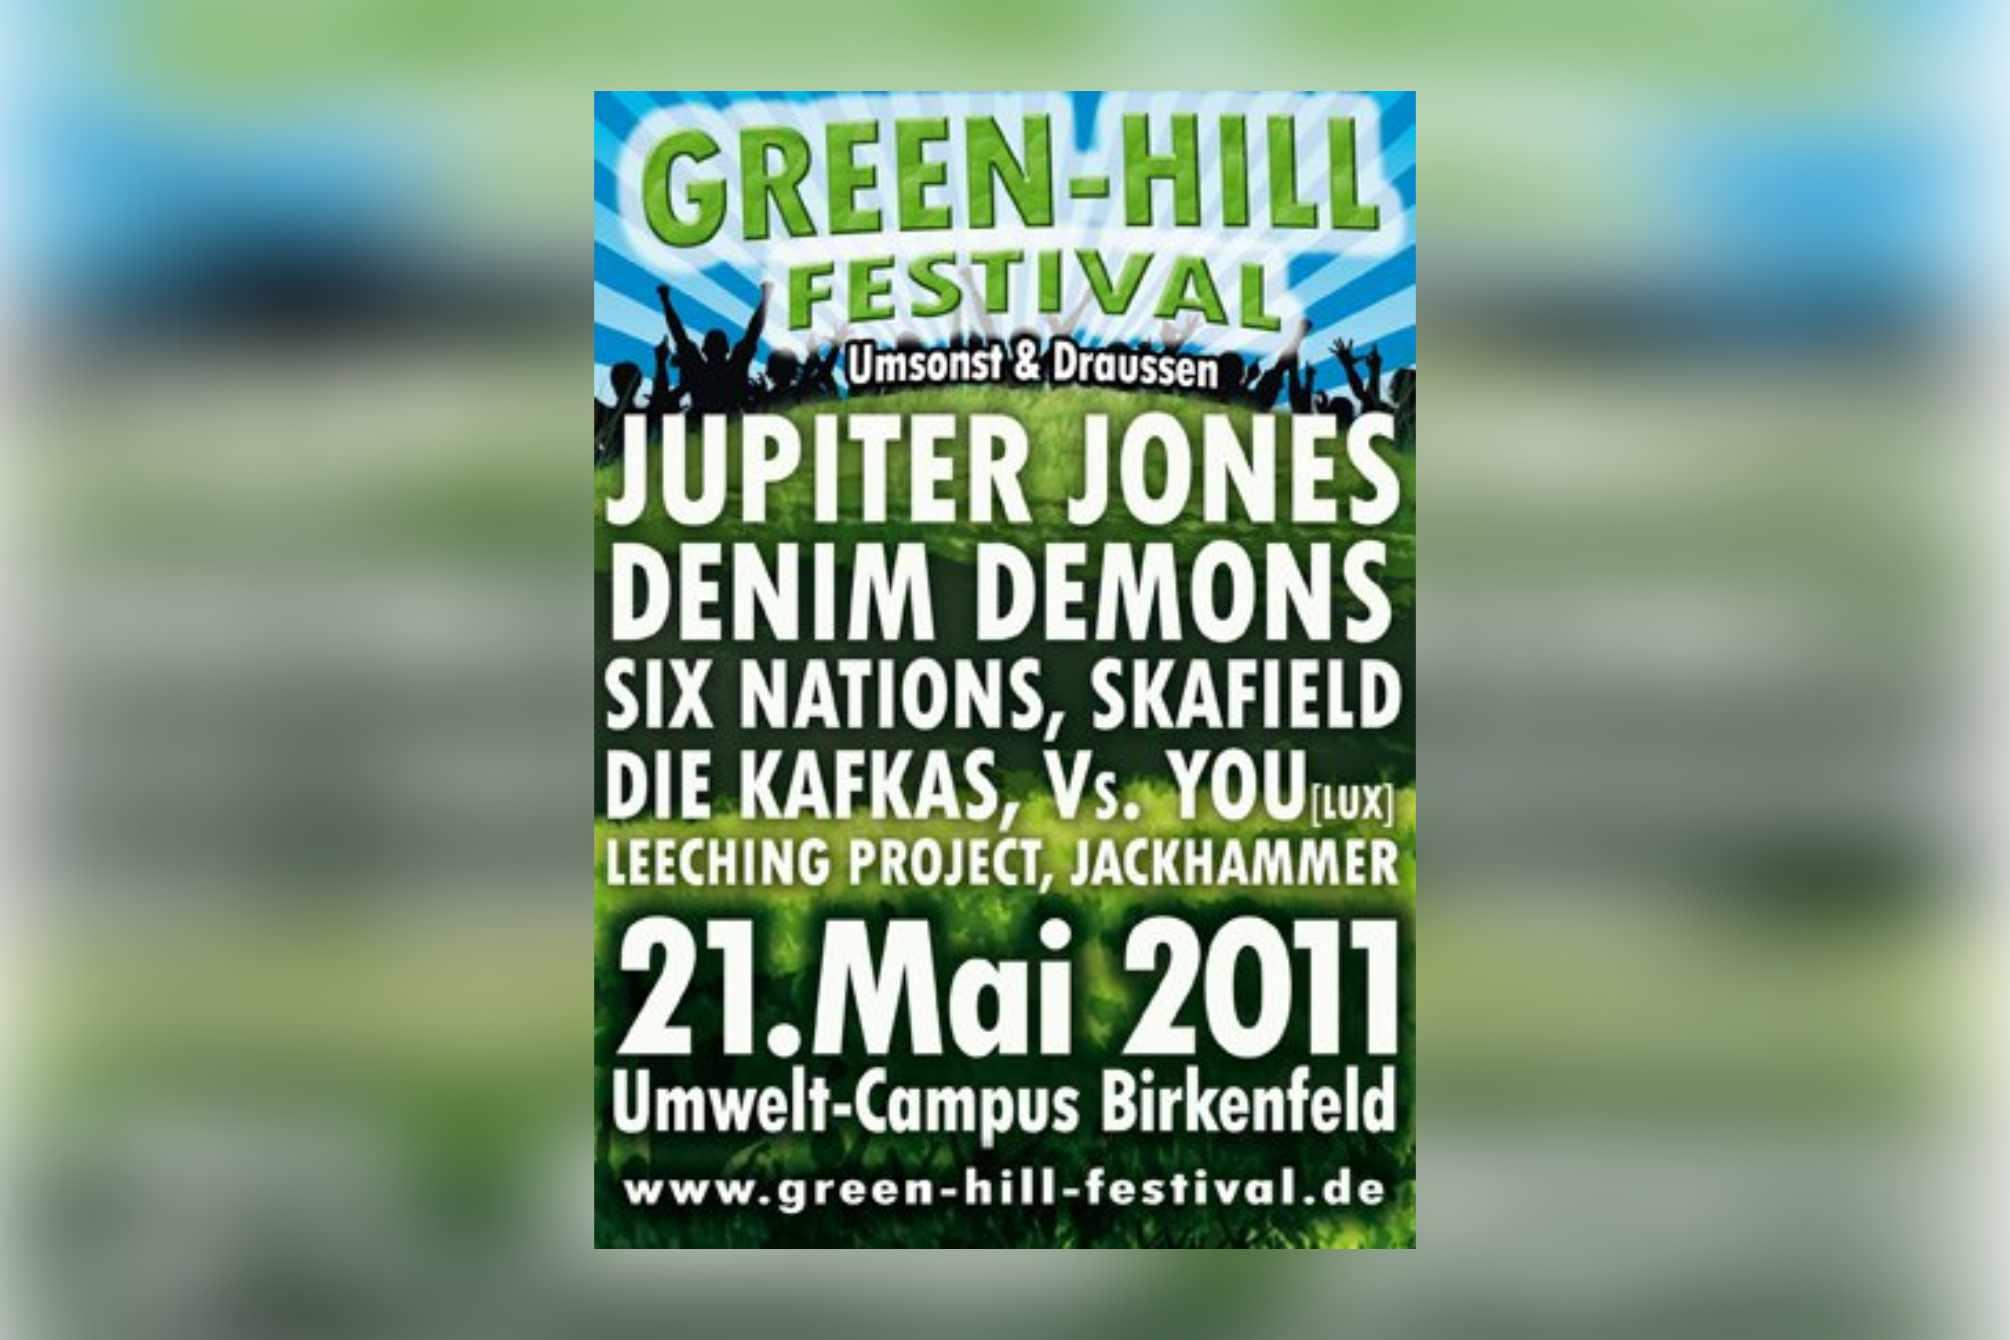 GreenHill 2011 am Umwelt-Campus